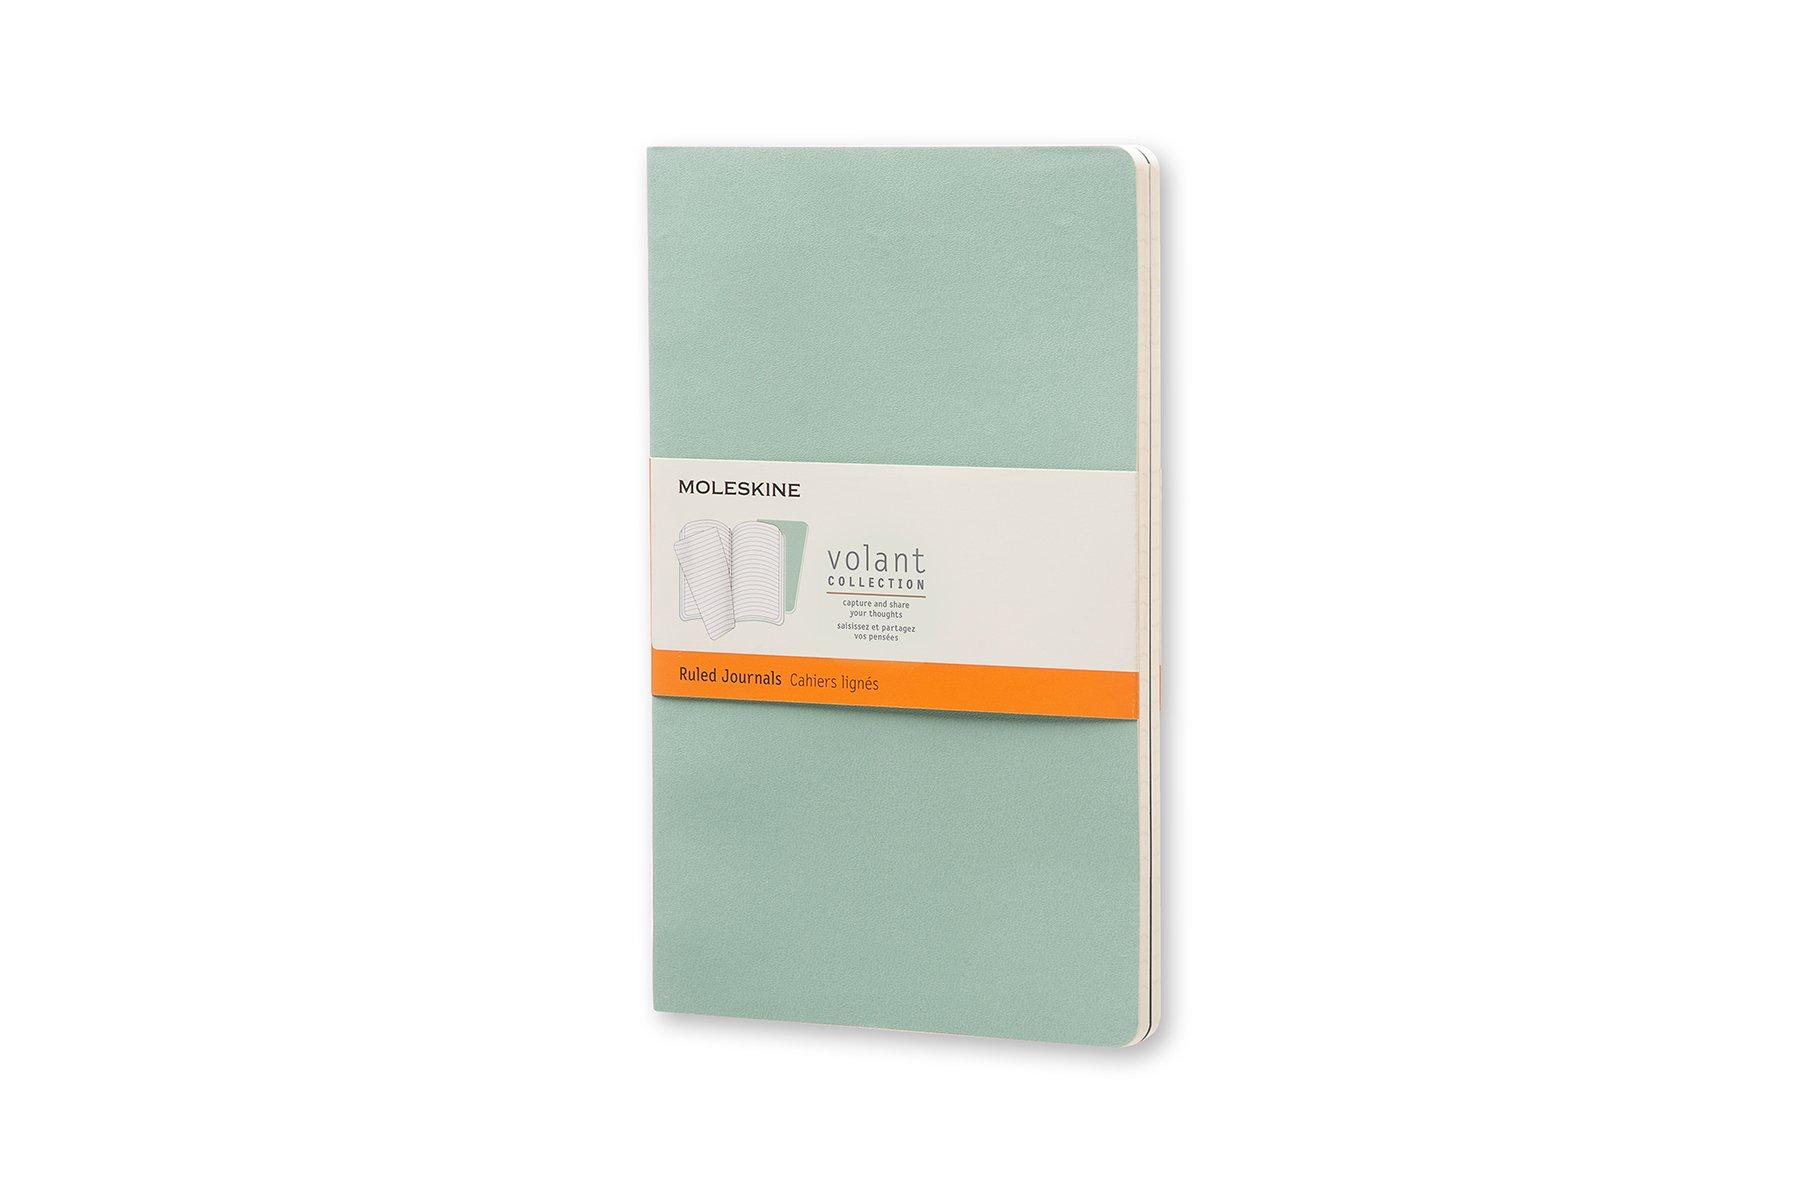 Moleskine Volant Soft Cover Journal, Set of 2, Ruled, ()